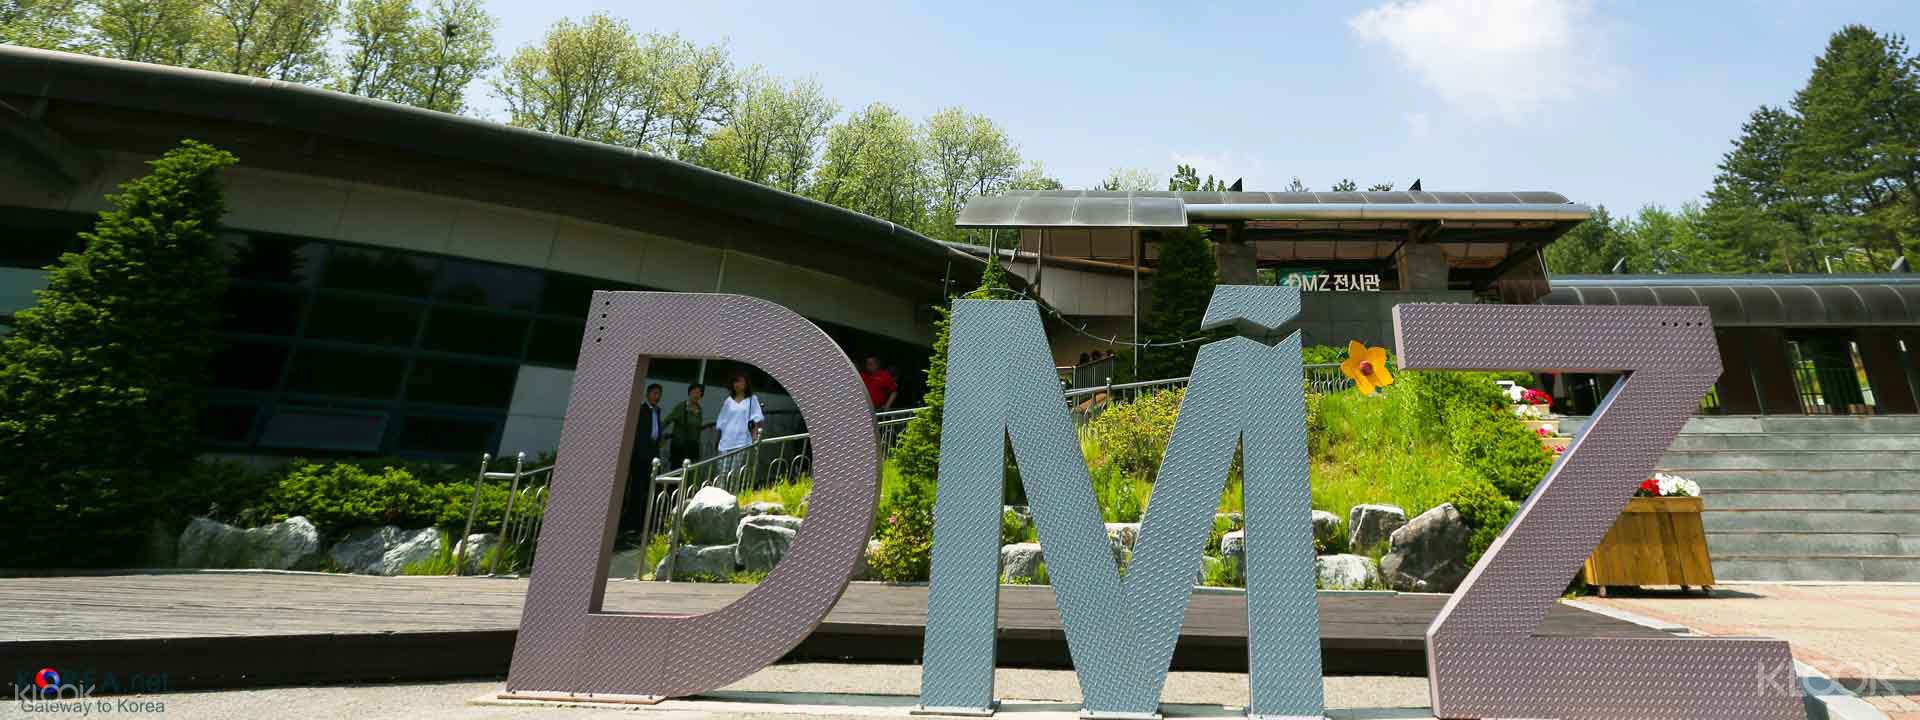 DMZ南北韓非武裝地帶/非軍事區一日遊 - Klook客路